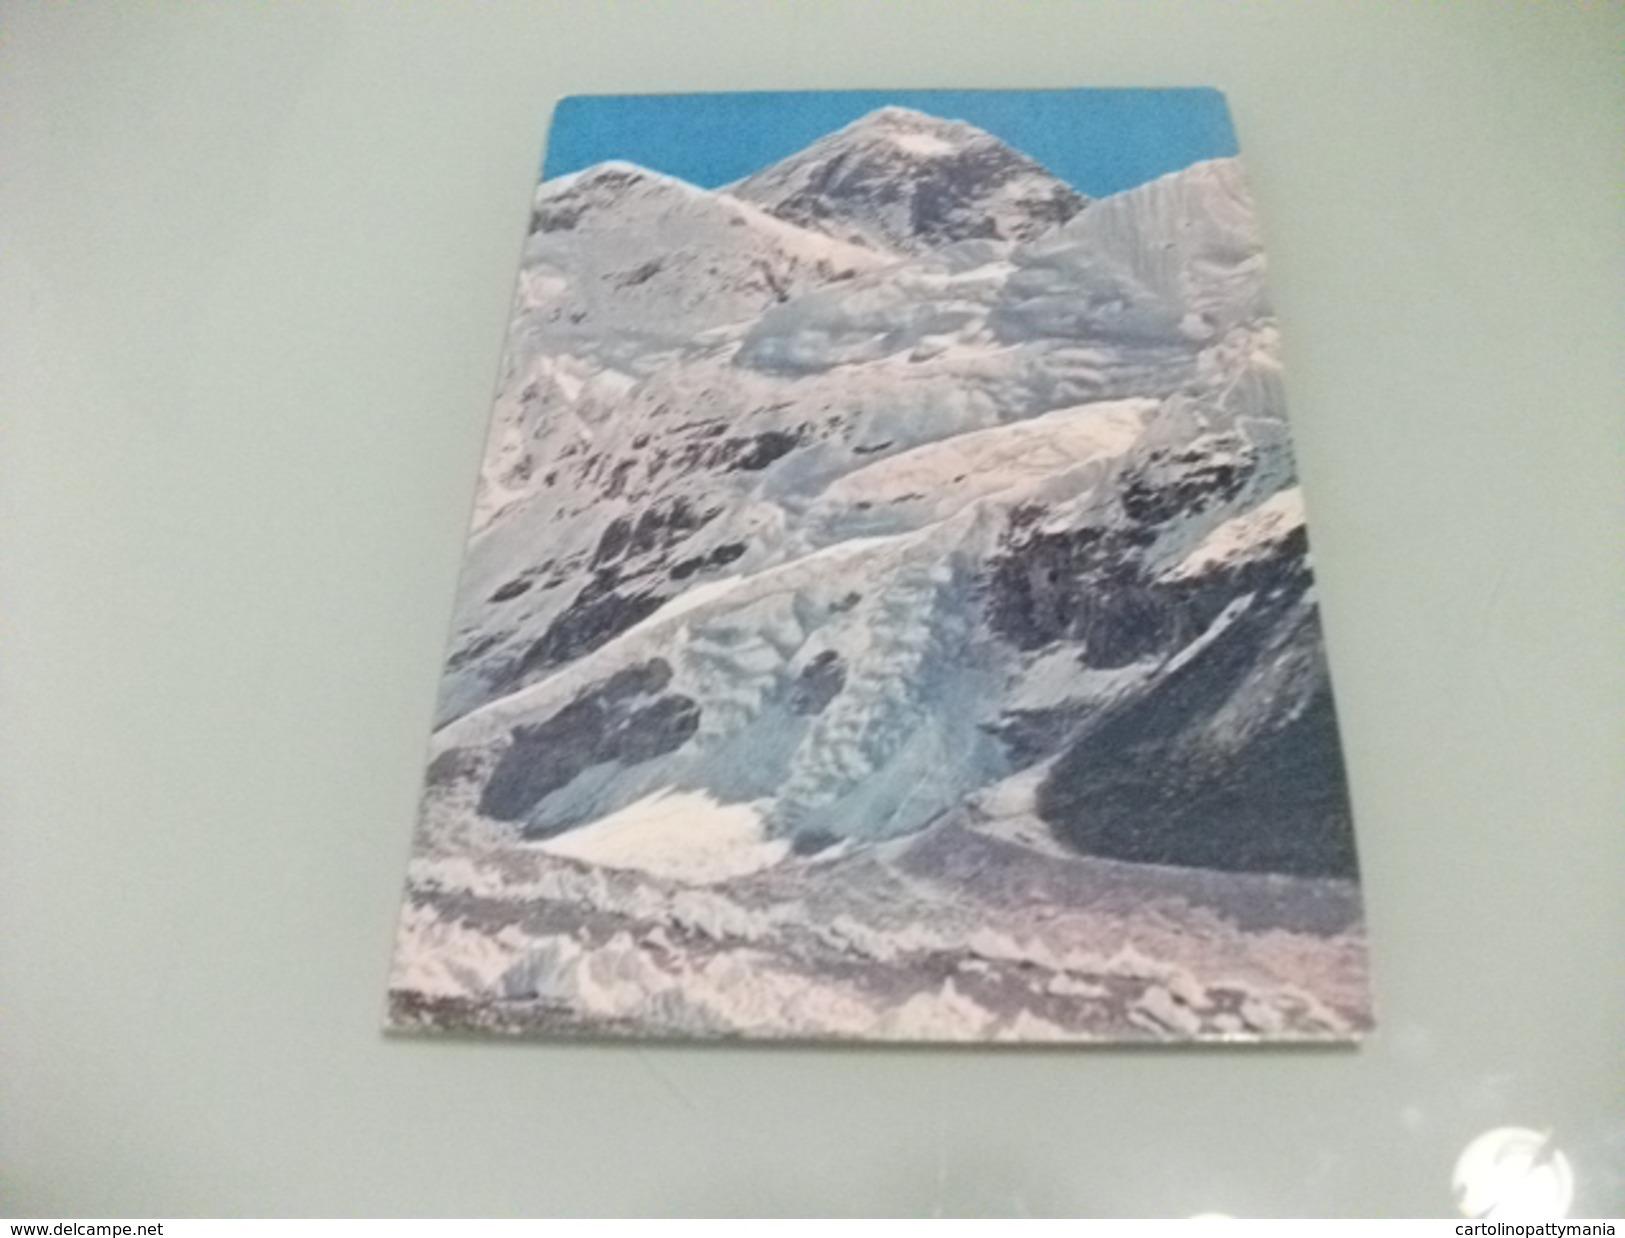 STORIA POSTALE FRANCOBOLLO COMMEMORATIVO NEPAL MONTE EVEREST AFFRANCATURA MULTIPLA - Nepal